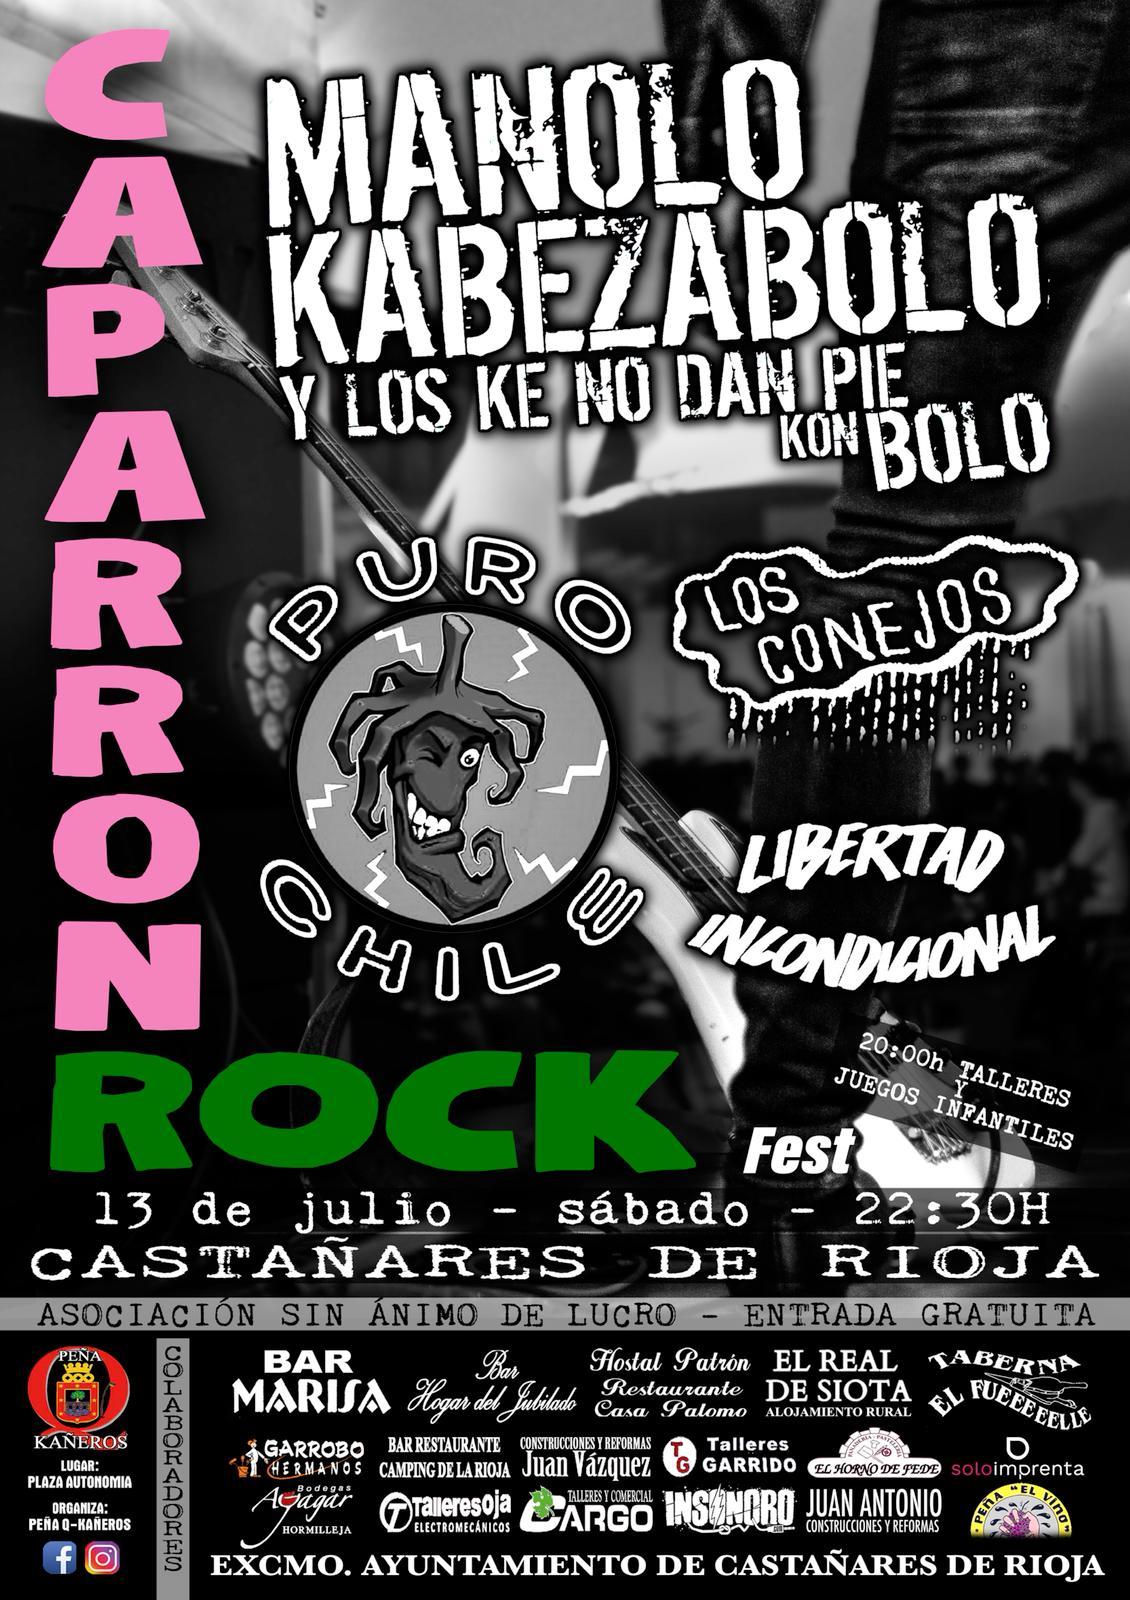 Manolo Kabezabolo comanda el Caparrón Rock Fest que regresa este sábado a Castañares 2